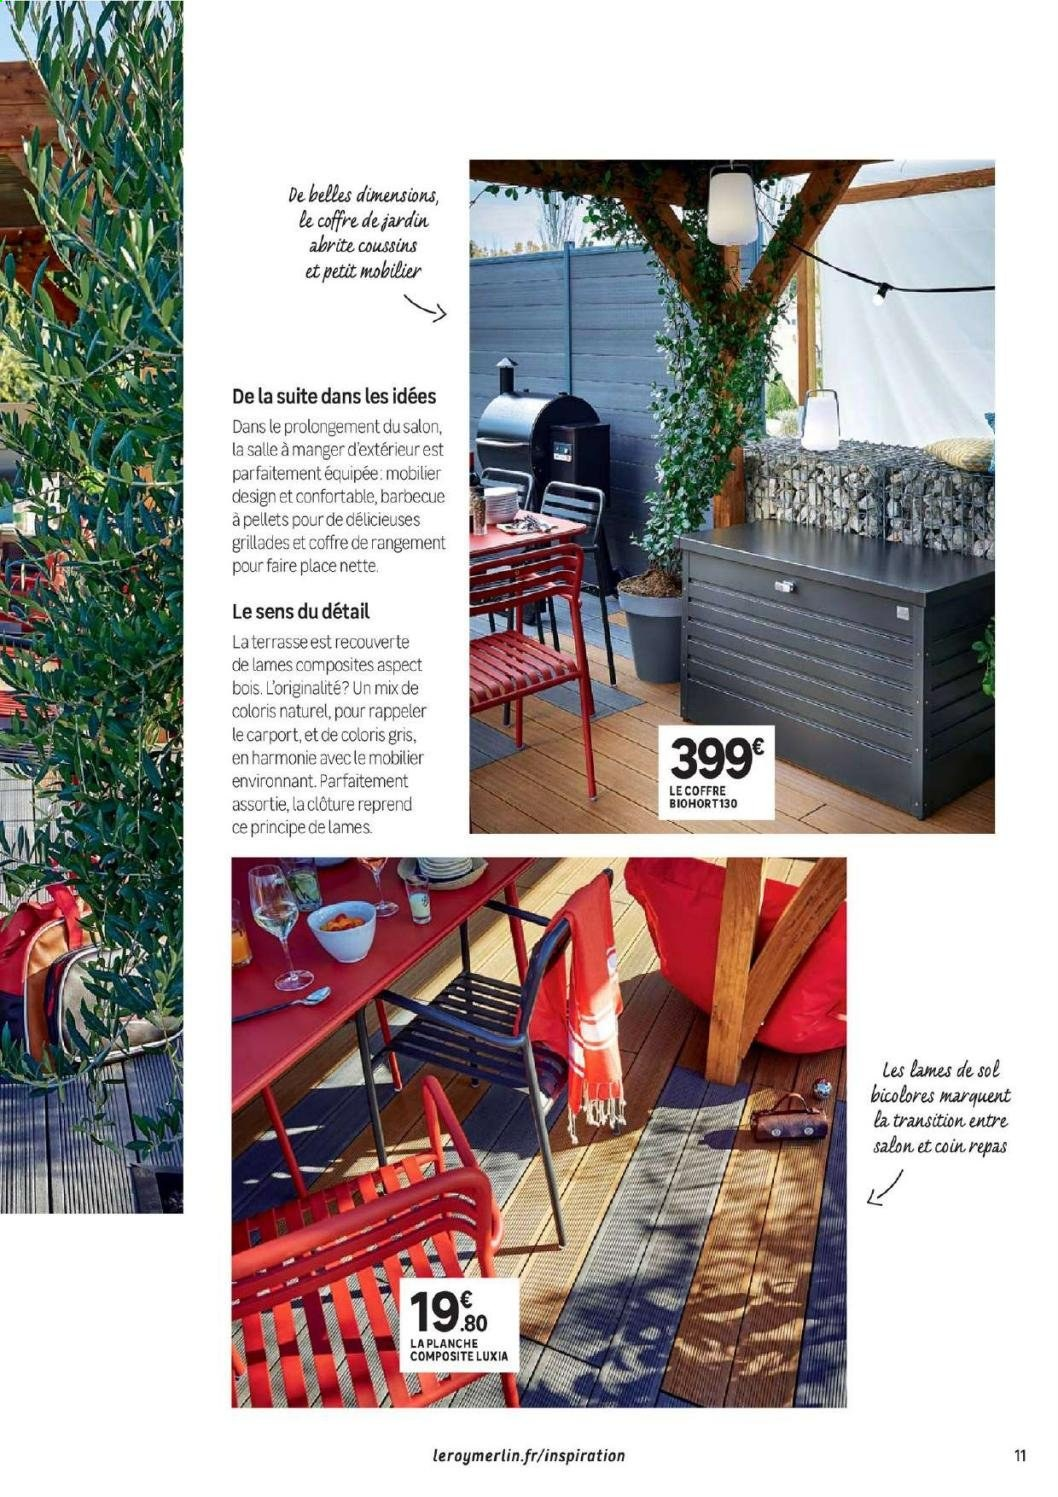 Salon De Jardin Confortable Charmant Coffre Rangement Terrasse Leroy Merlin Of 22 Best Of Salon De Jardin Confortable